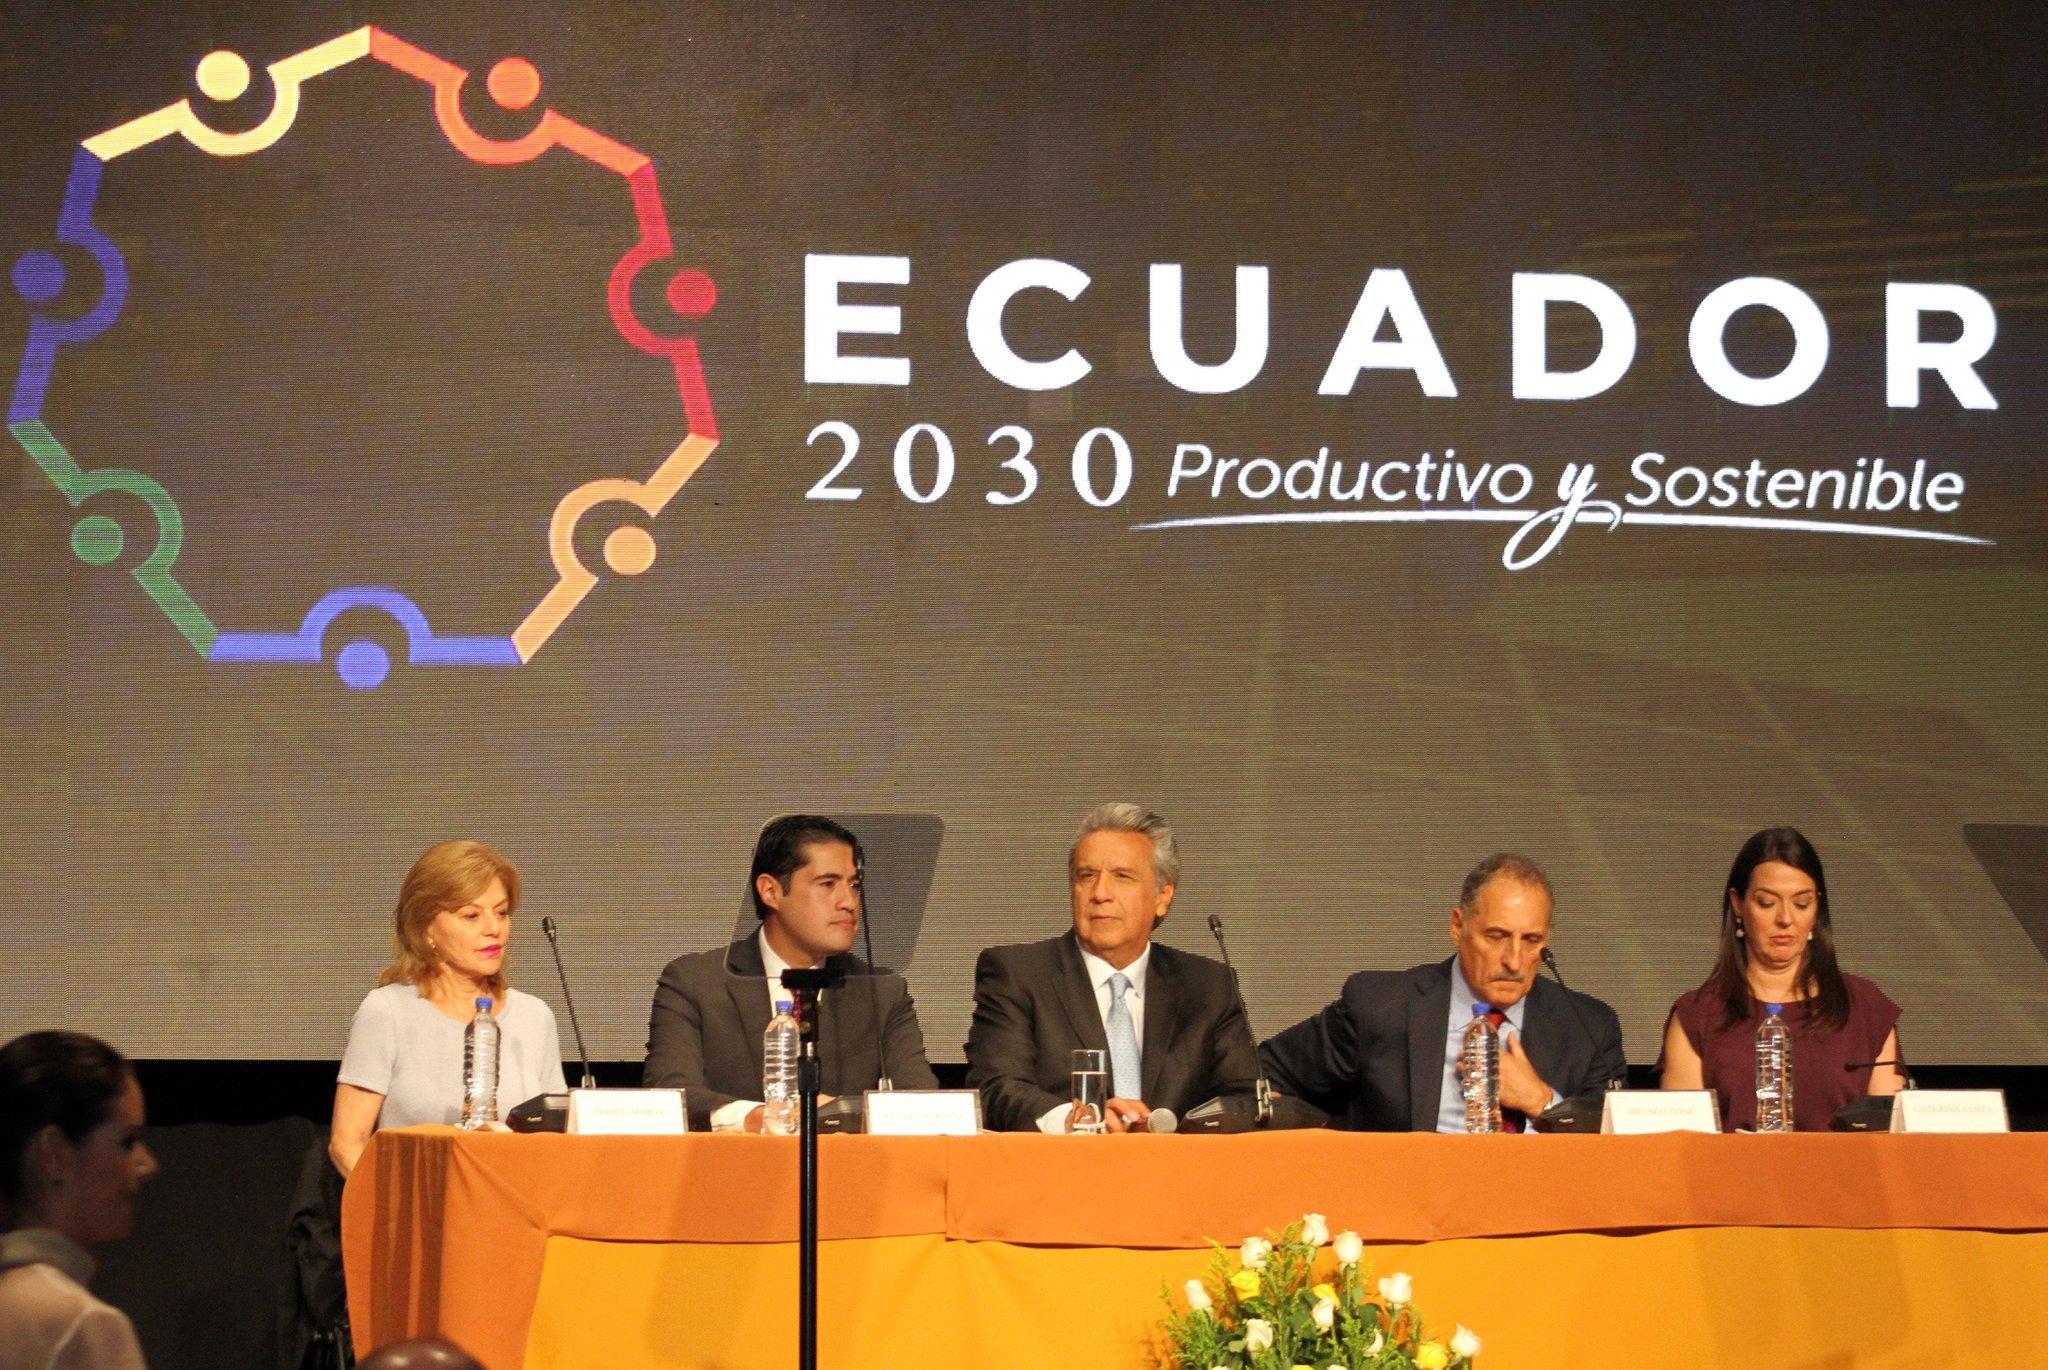 """Es importante empezar a pensar de manera diferente"", @Lenin Moreno #Ecuador2030 https://t.co/PwzGcLx4I0"